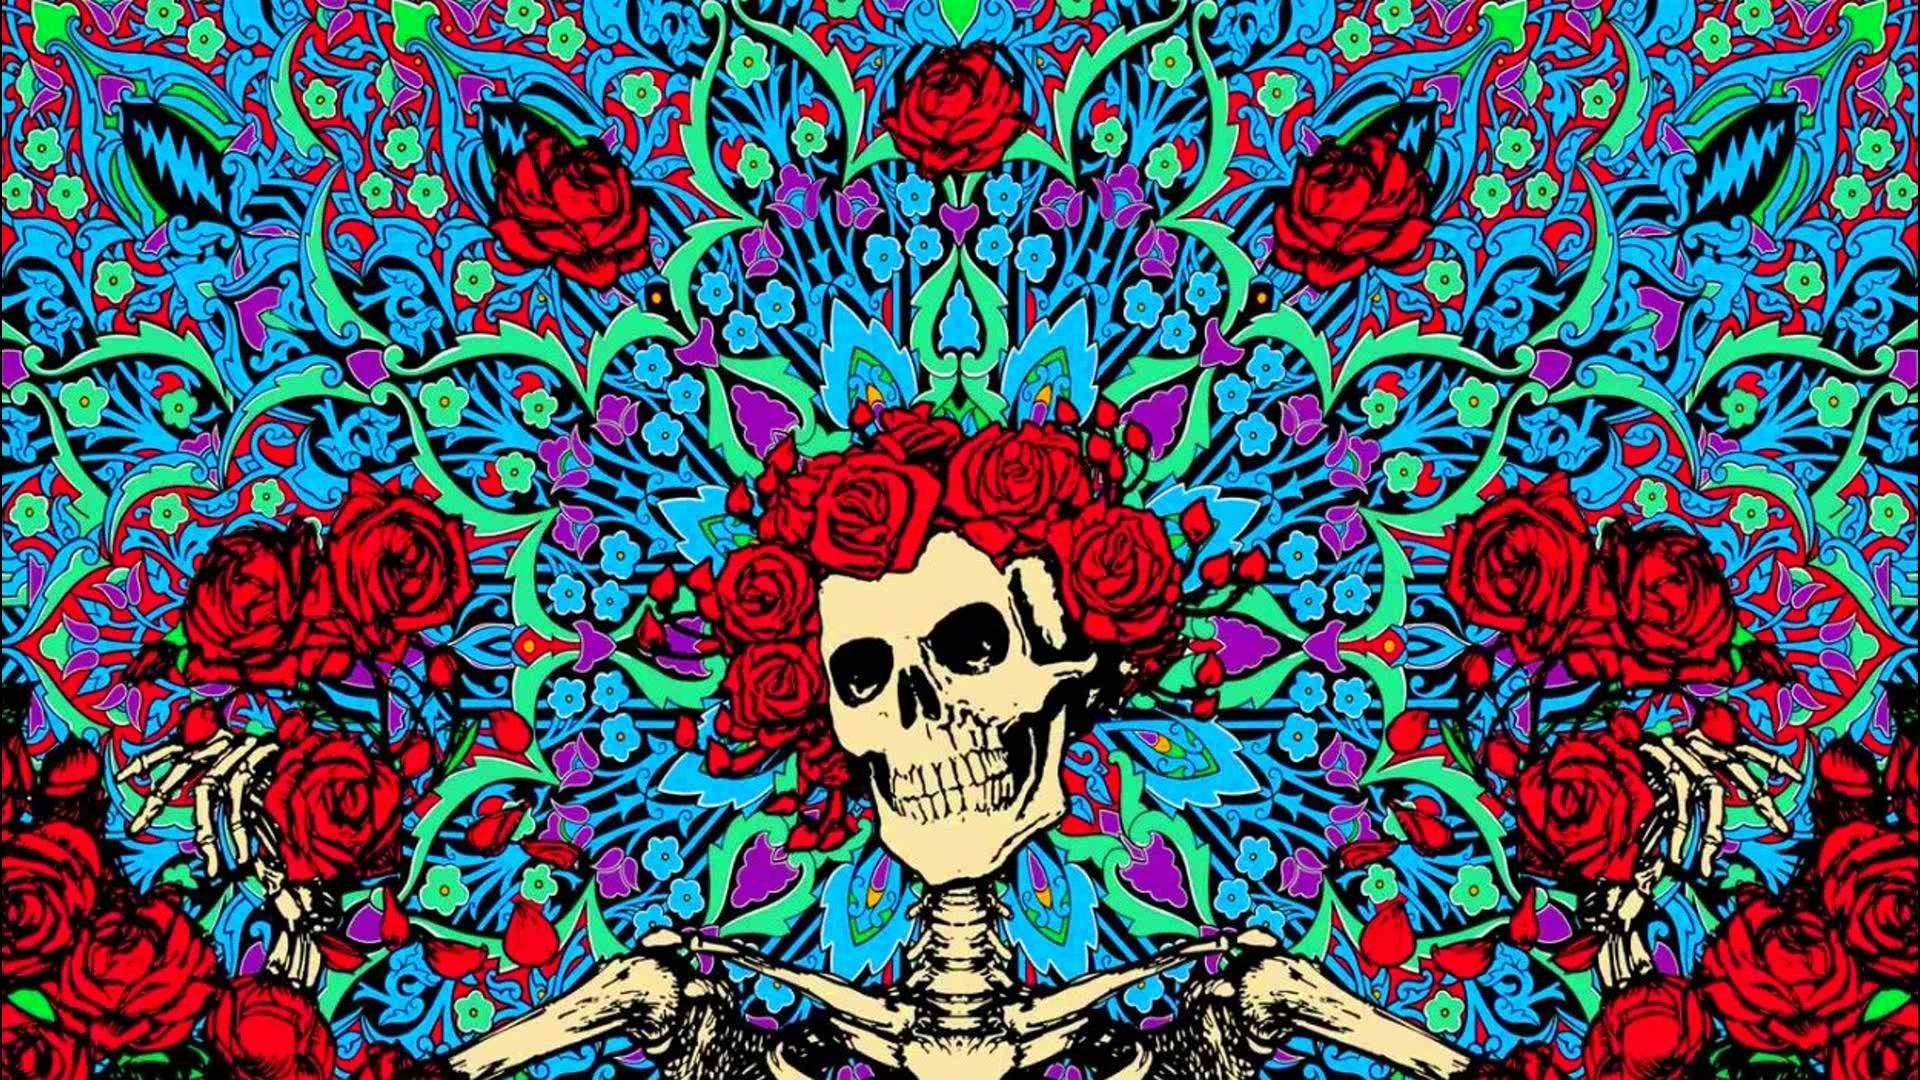 Dead Rose Download Wallpaper